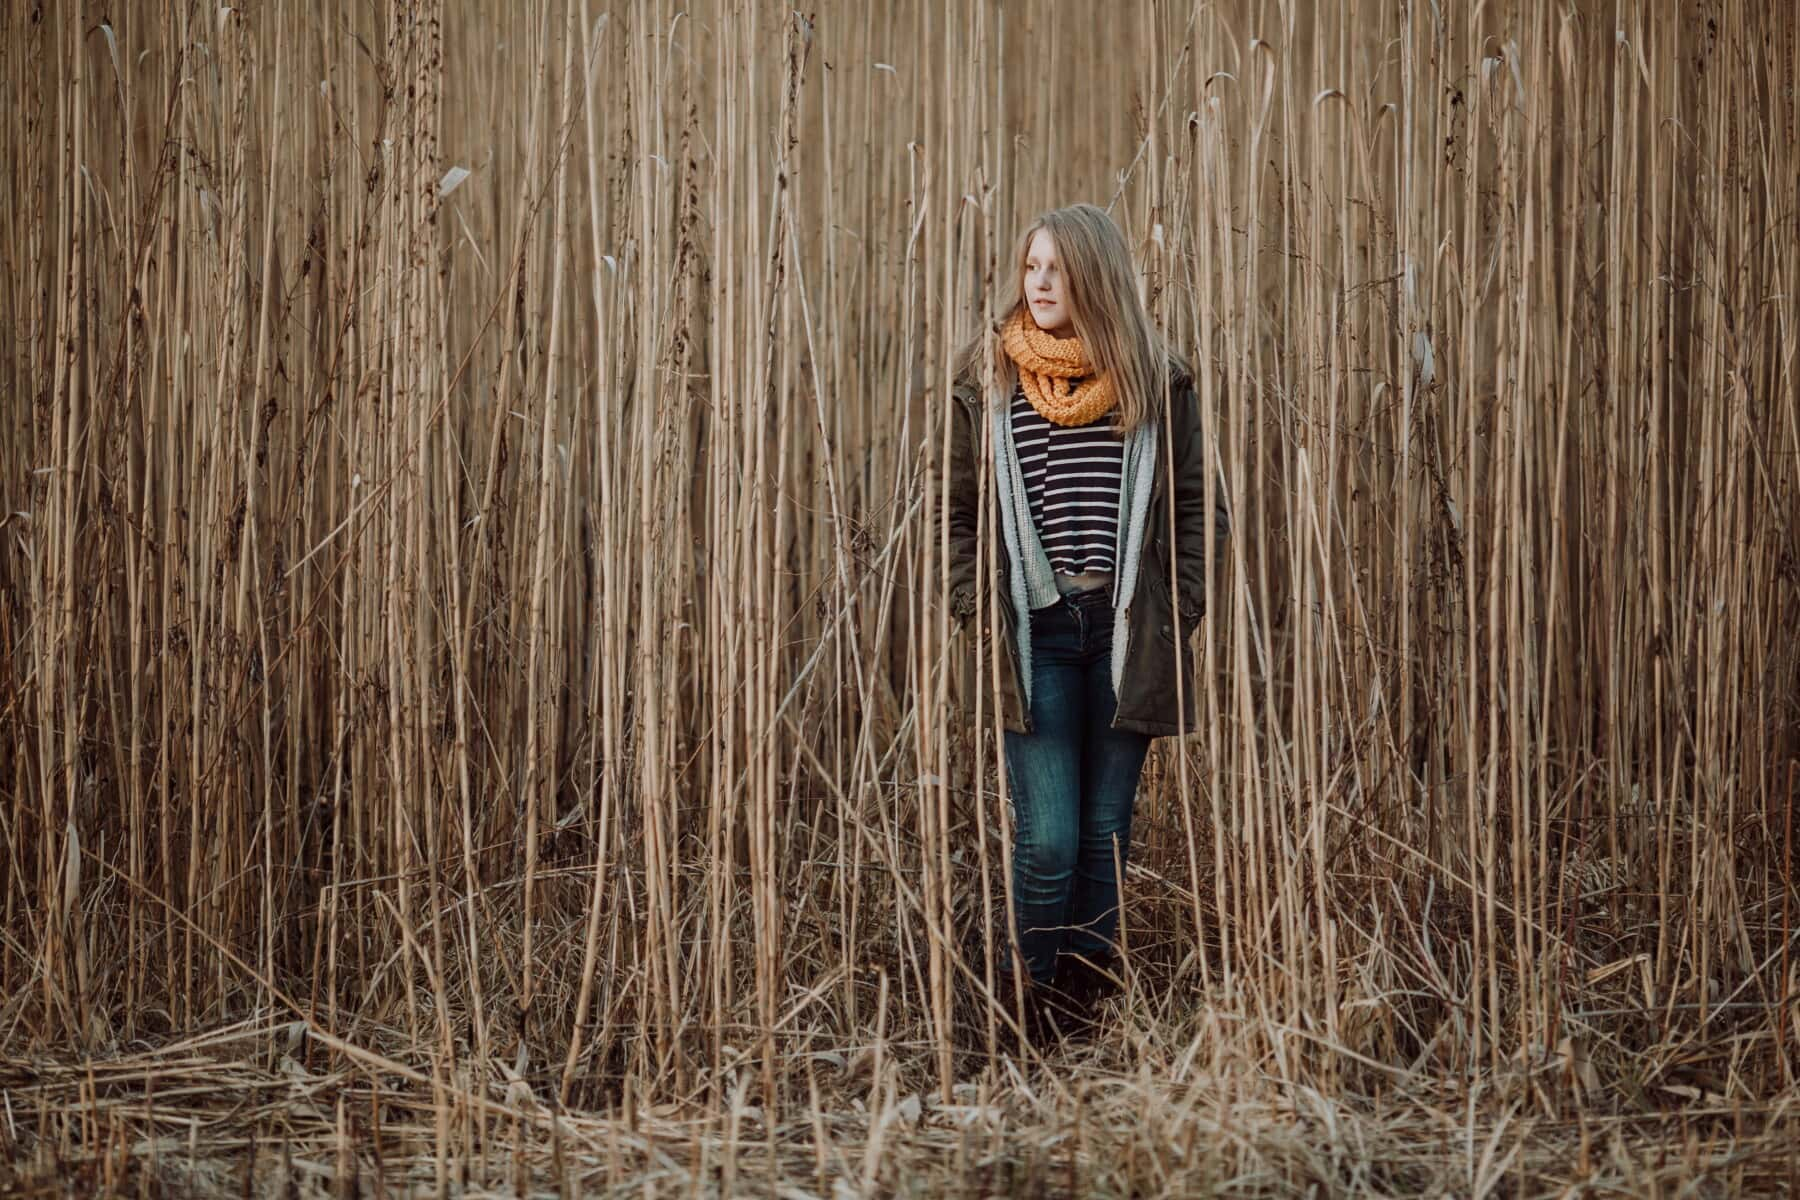 stojace, teenager, pole, poľnohospodárske, Šatka, sveter, chladný, bunda, Letná sezóna, dievča